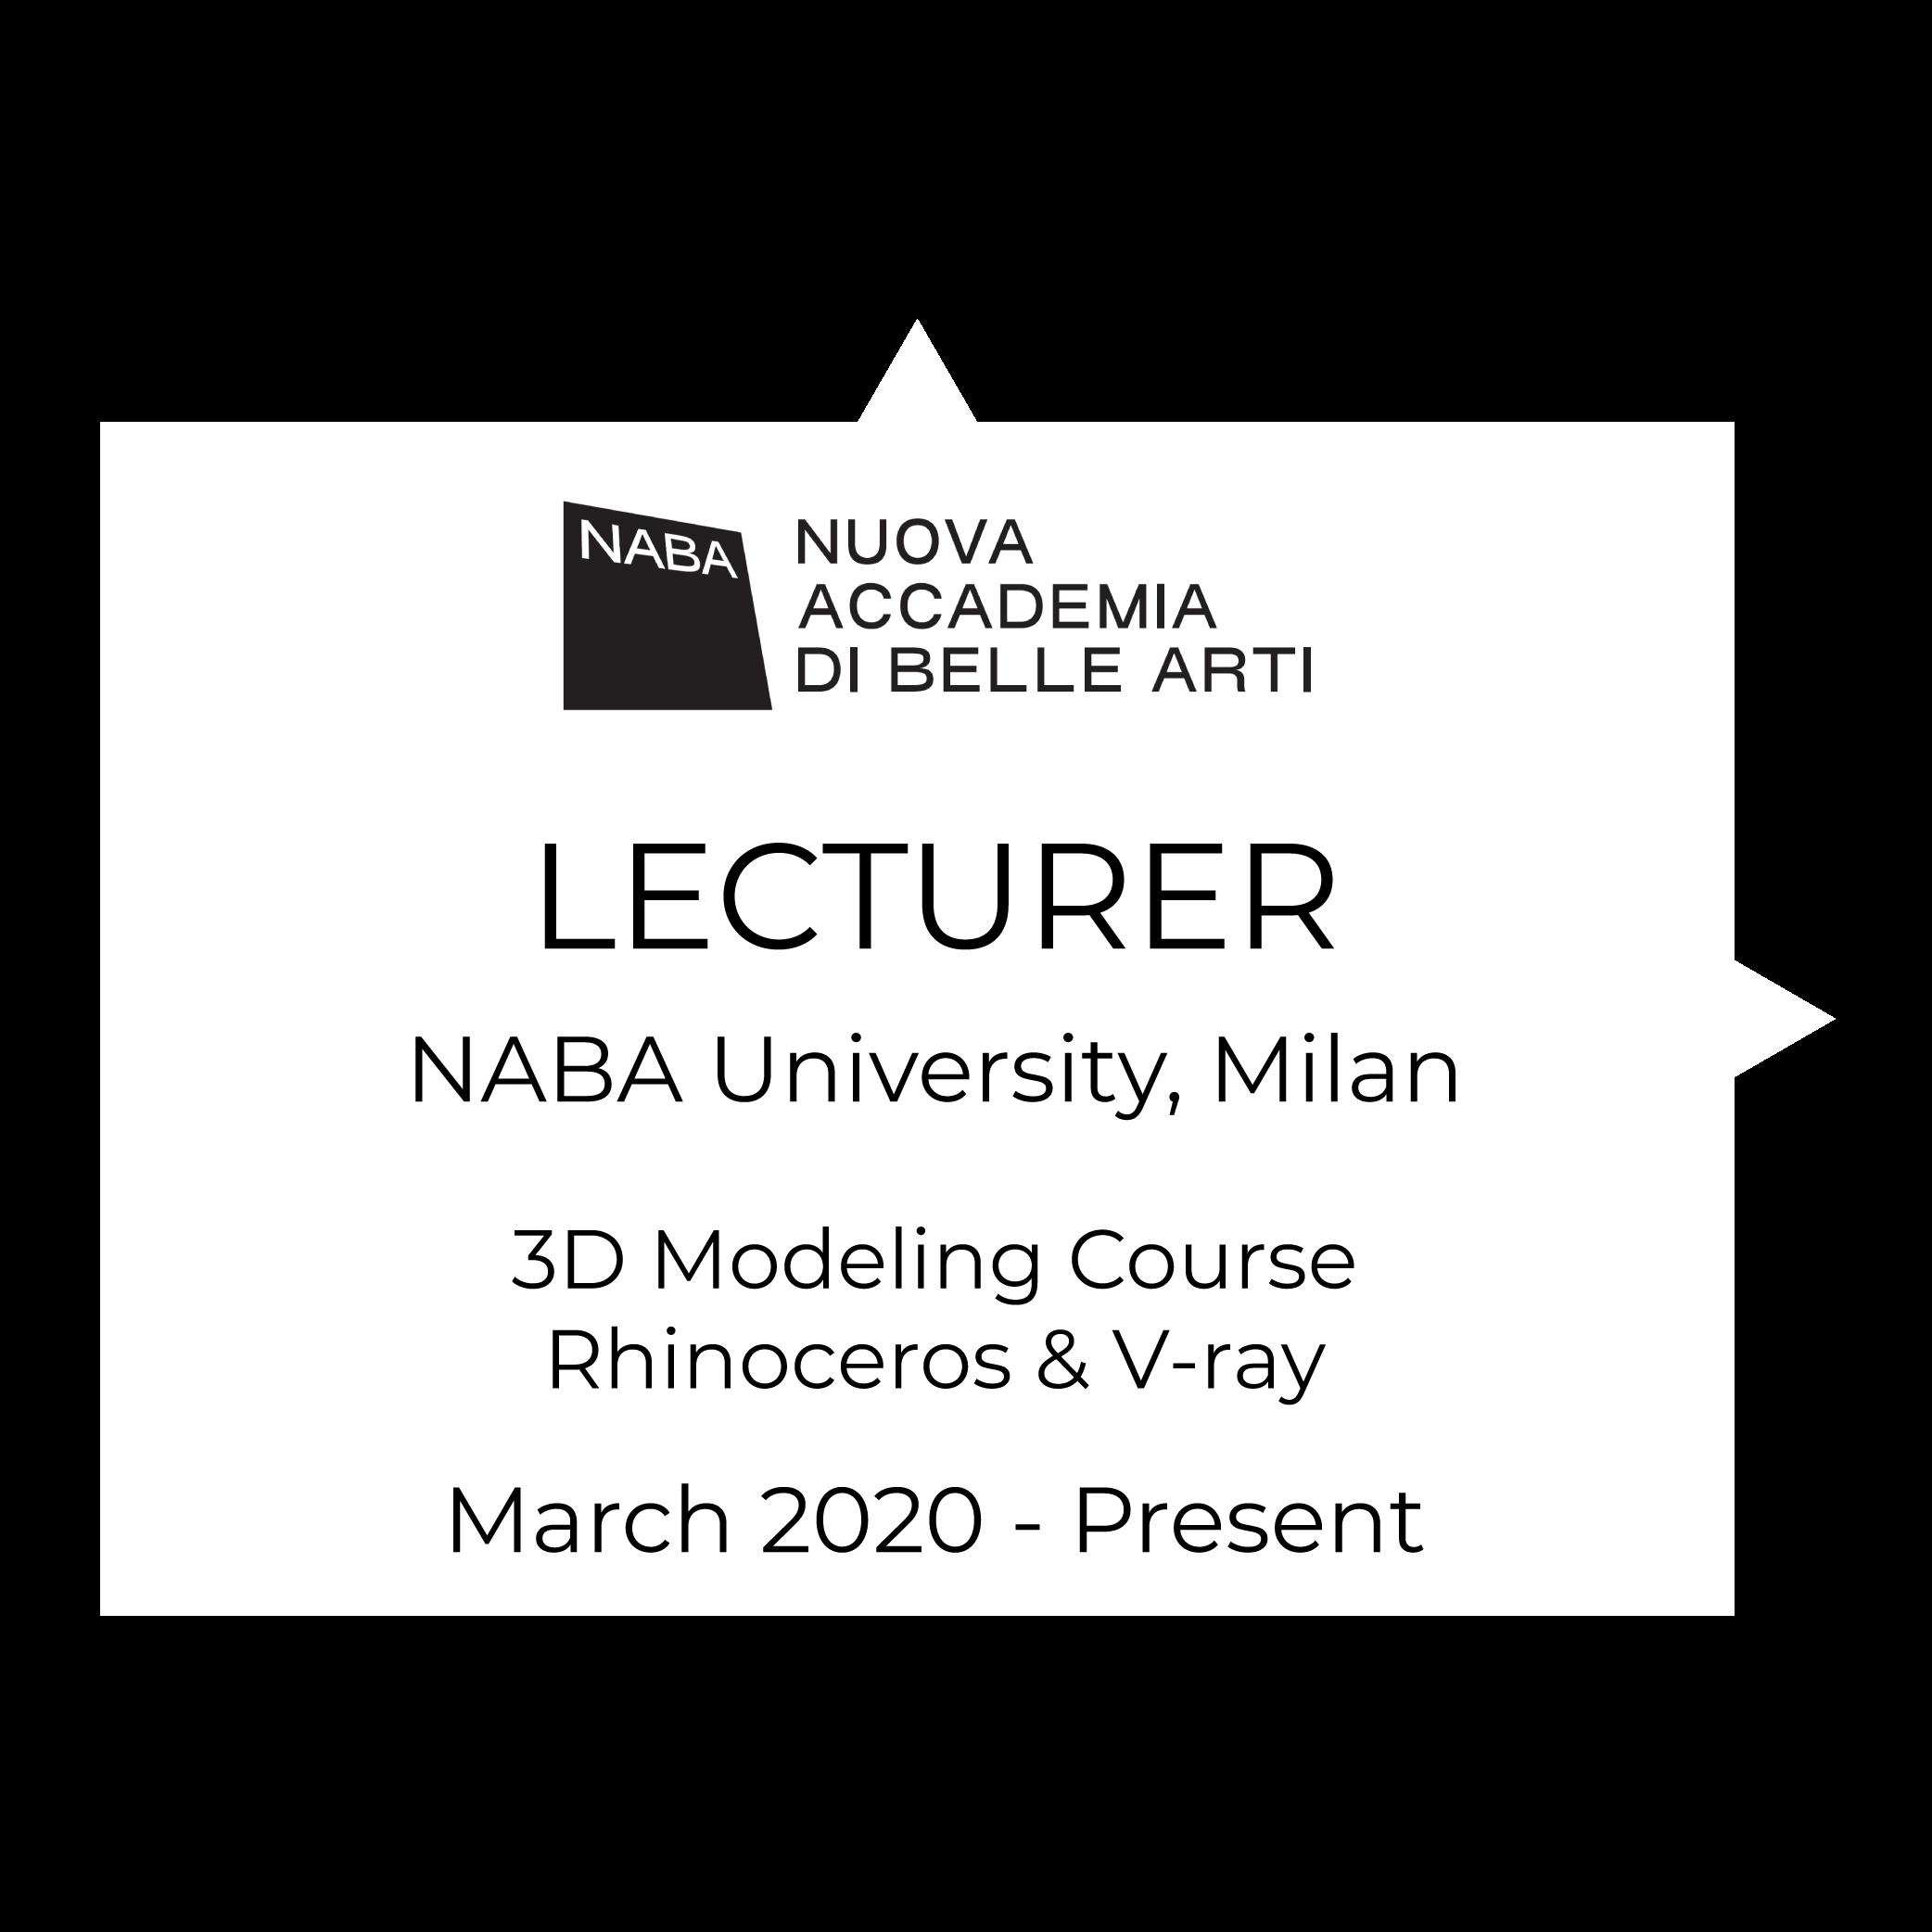 Resume-Lecturer_NABA_Rhino_V-ray-Marco-Bonanni